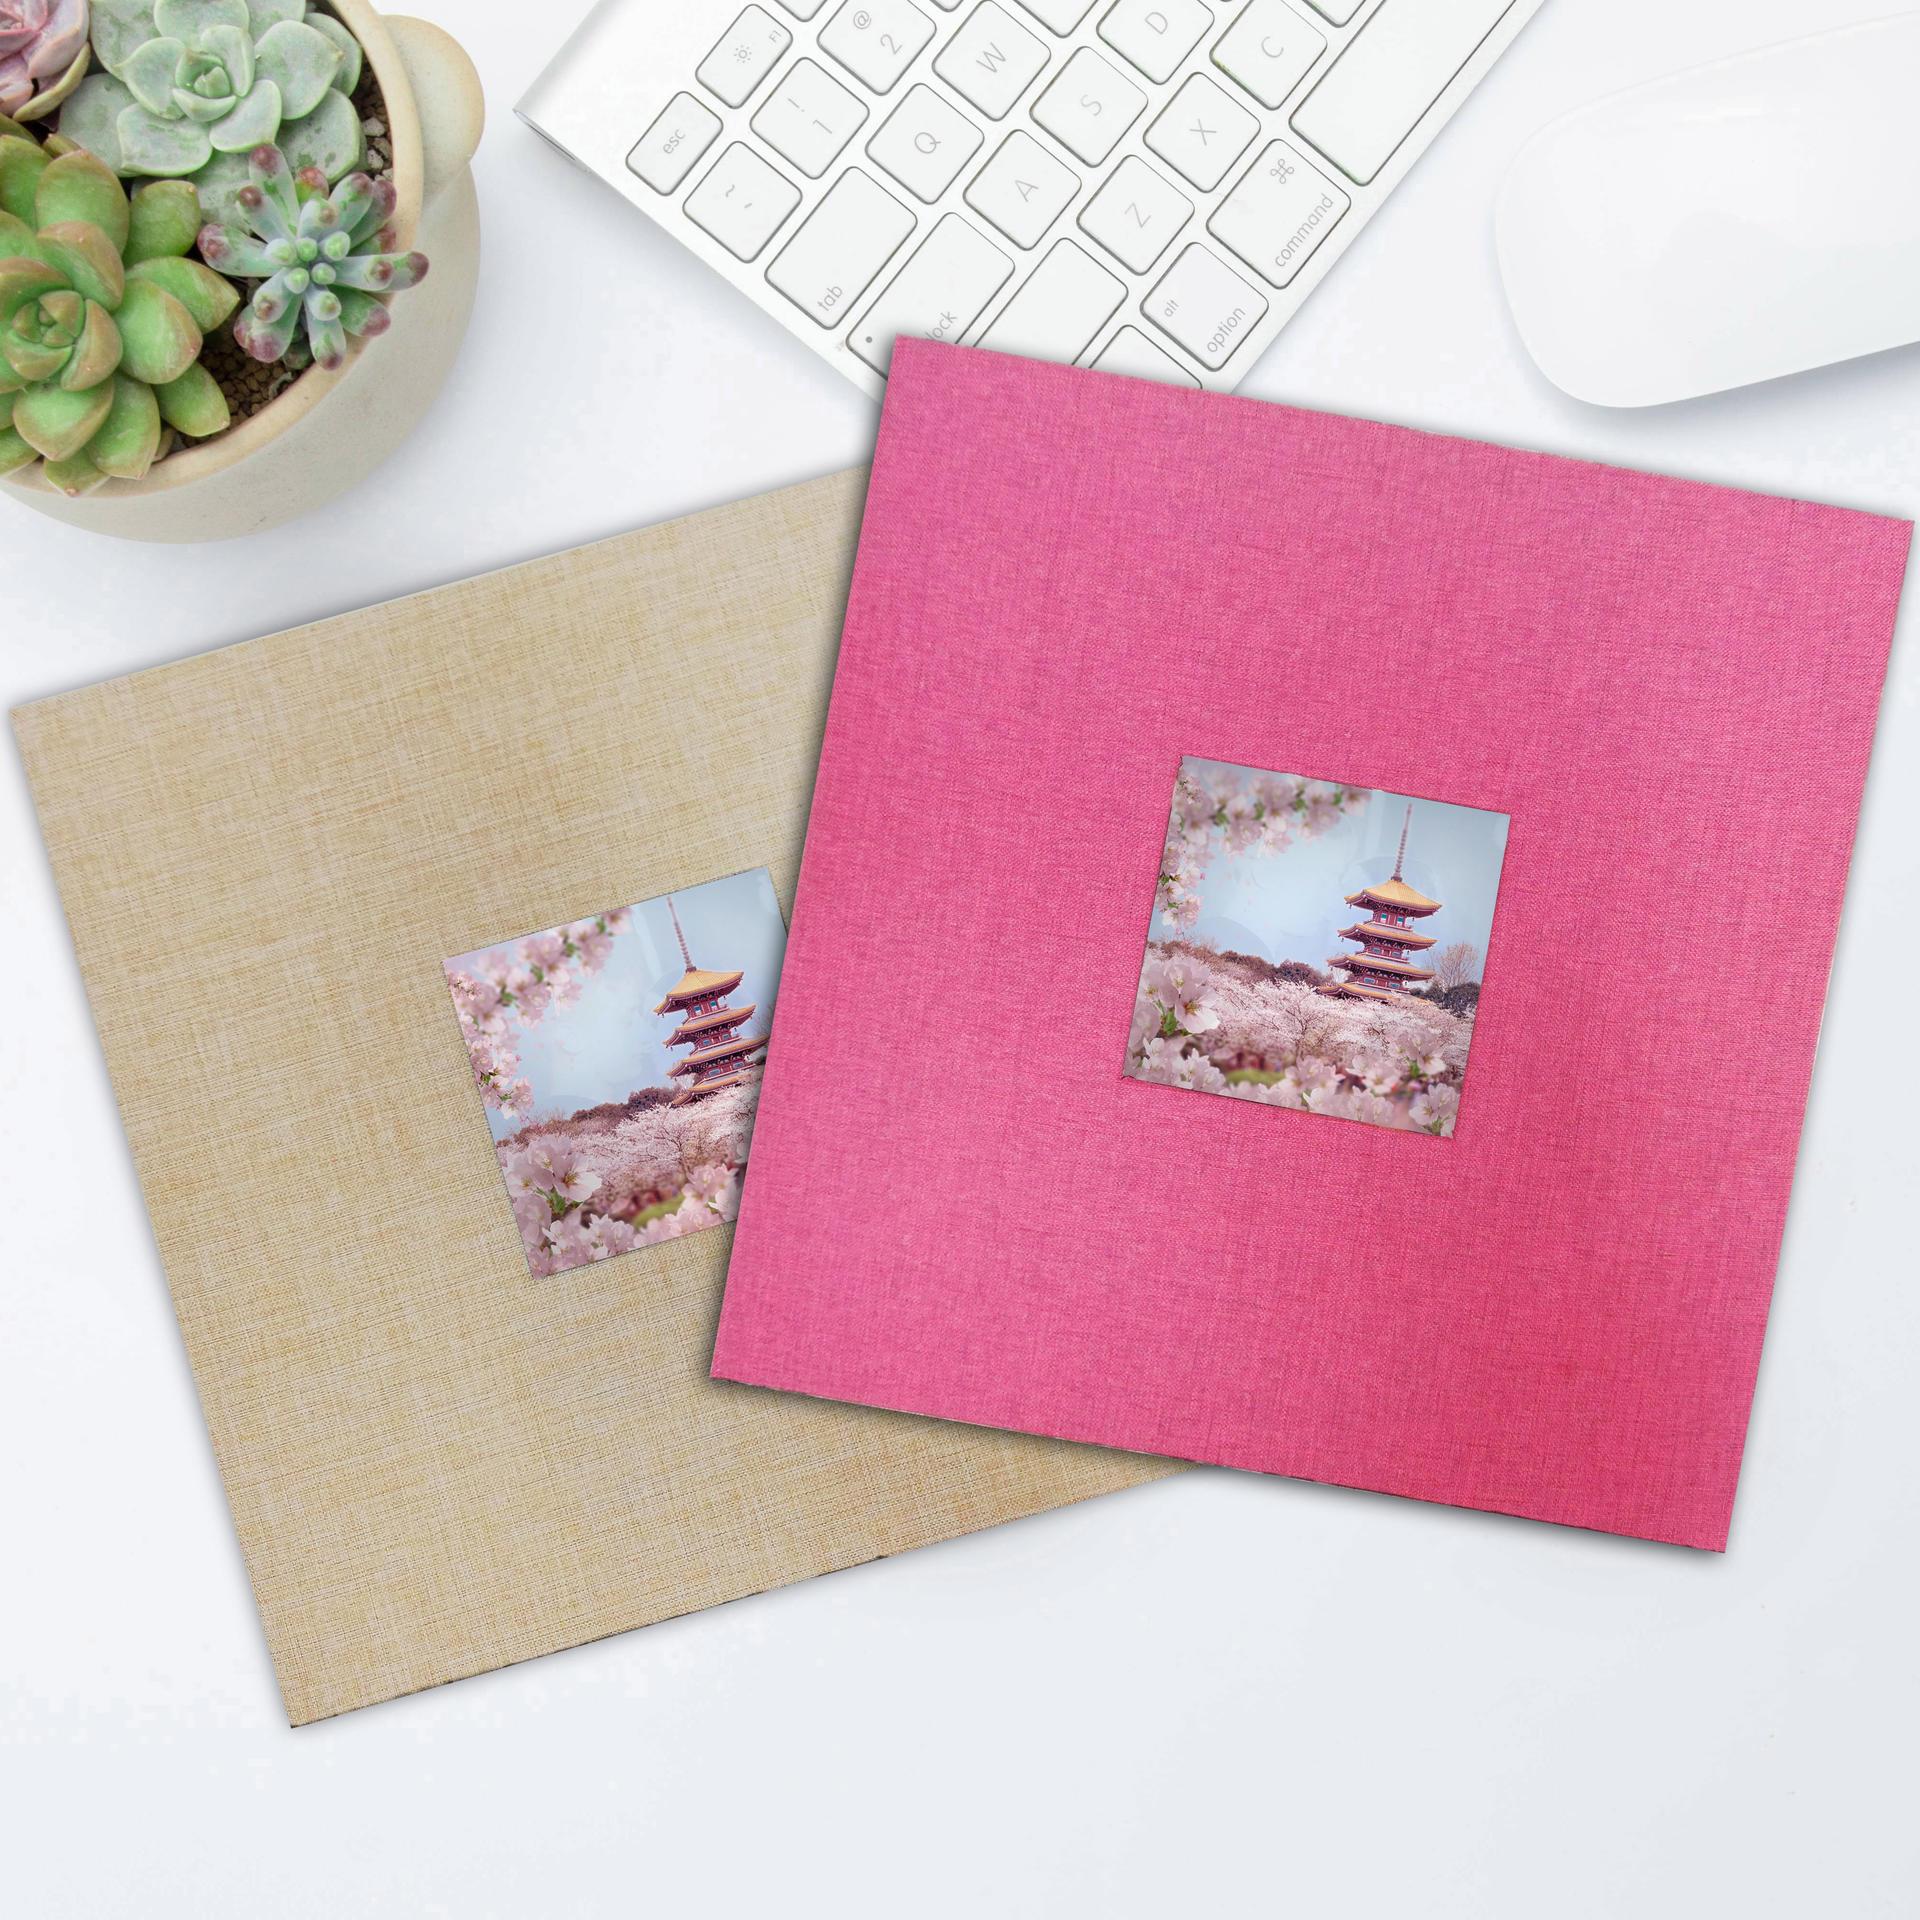 product-Dezheng-Custom Hardcover Window Scrapbook Self-adhesive Baby Photo Album Spiral Creative DIY-1